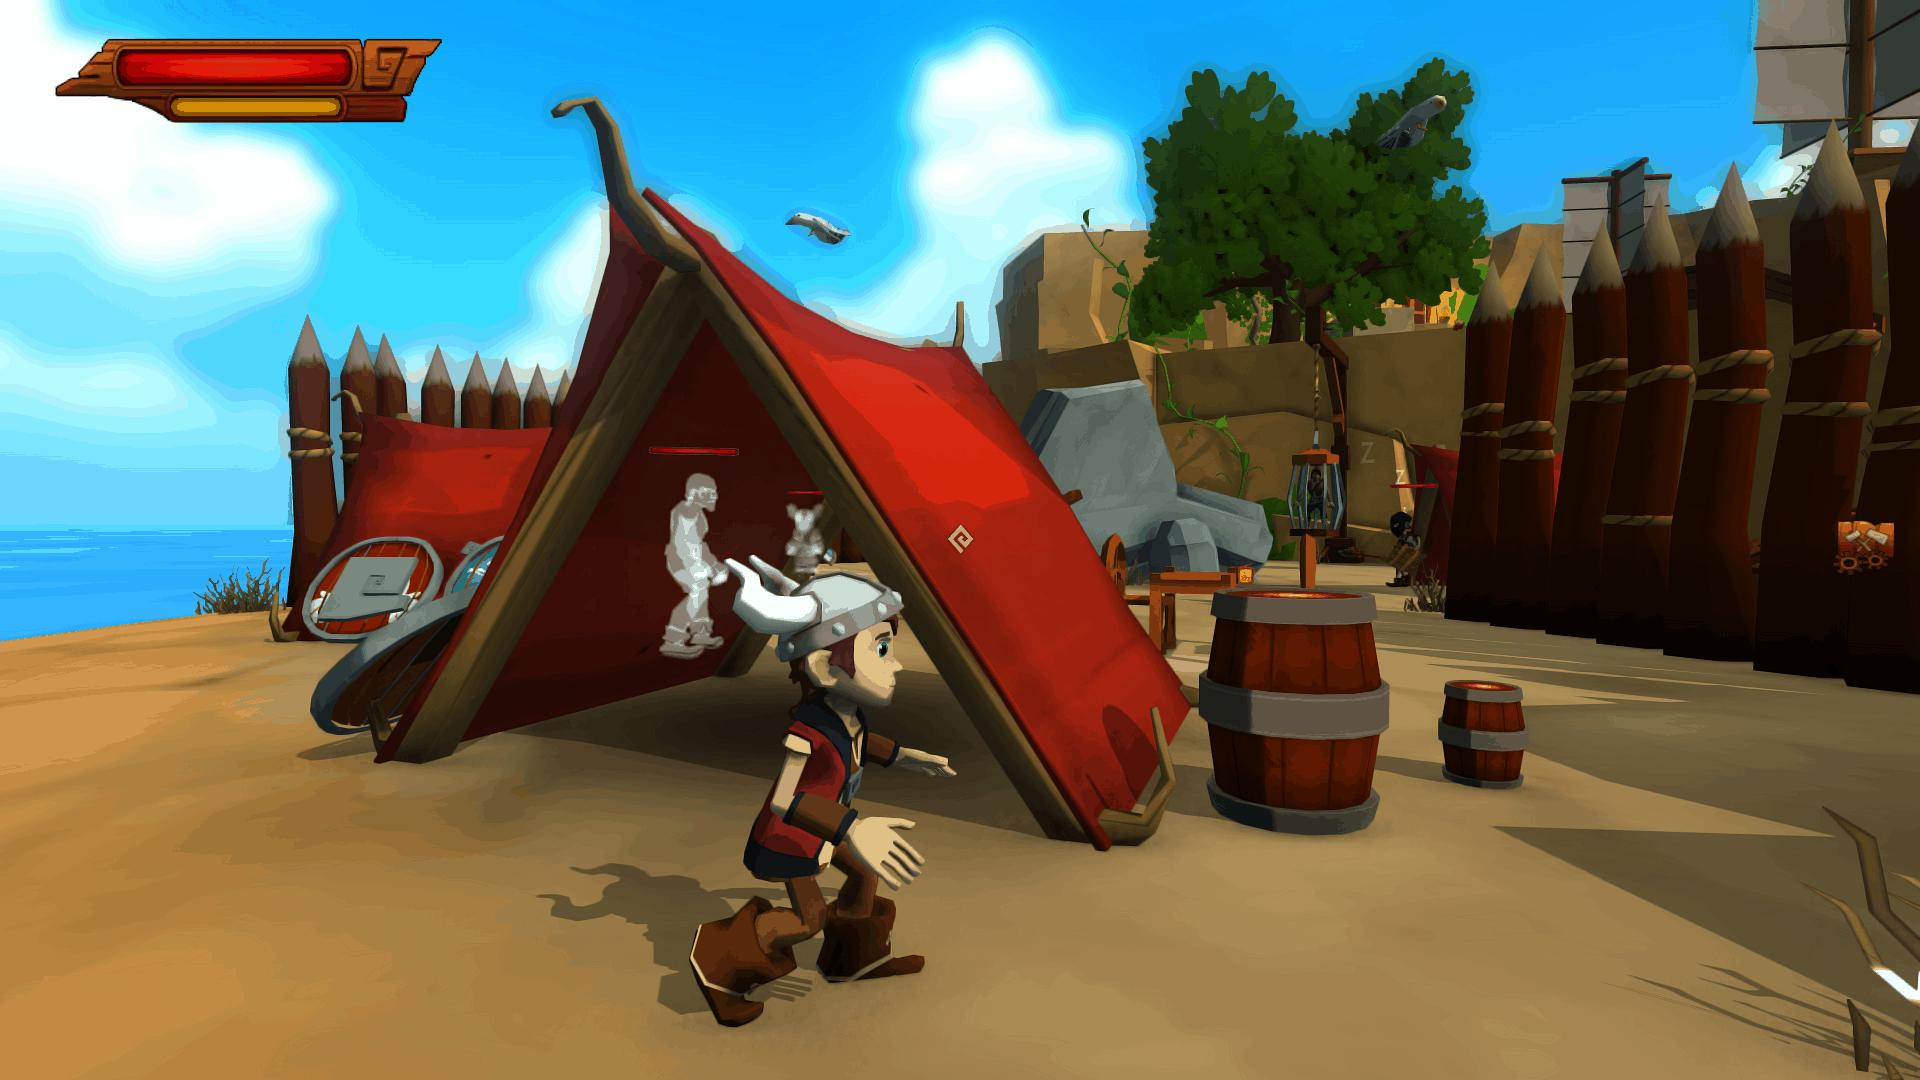 Cornerstone game screenshot, bandit camp